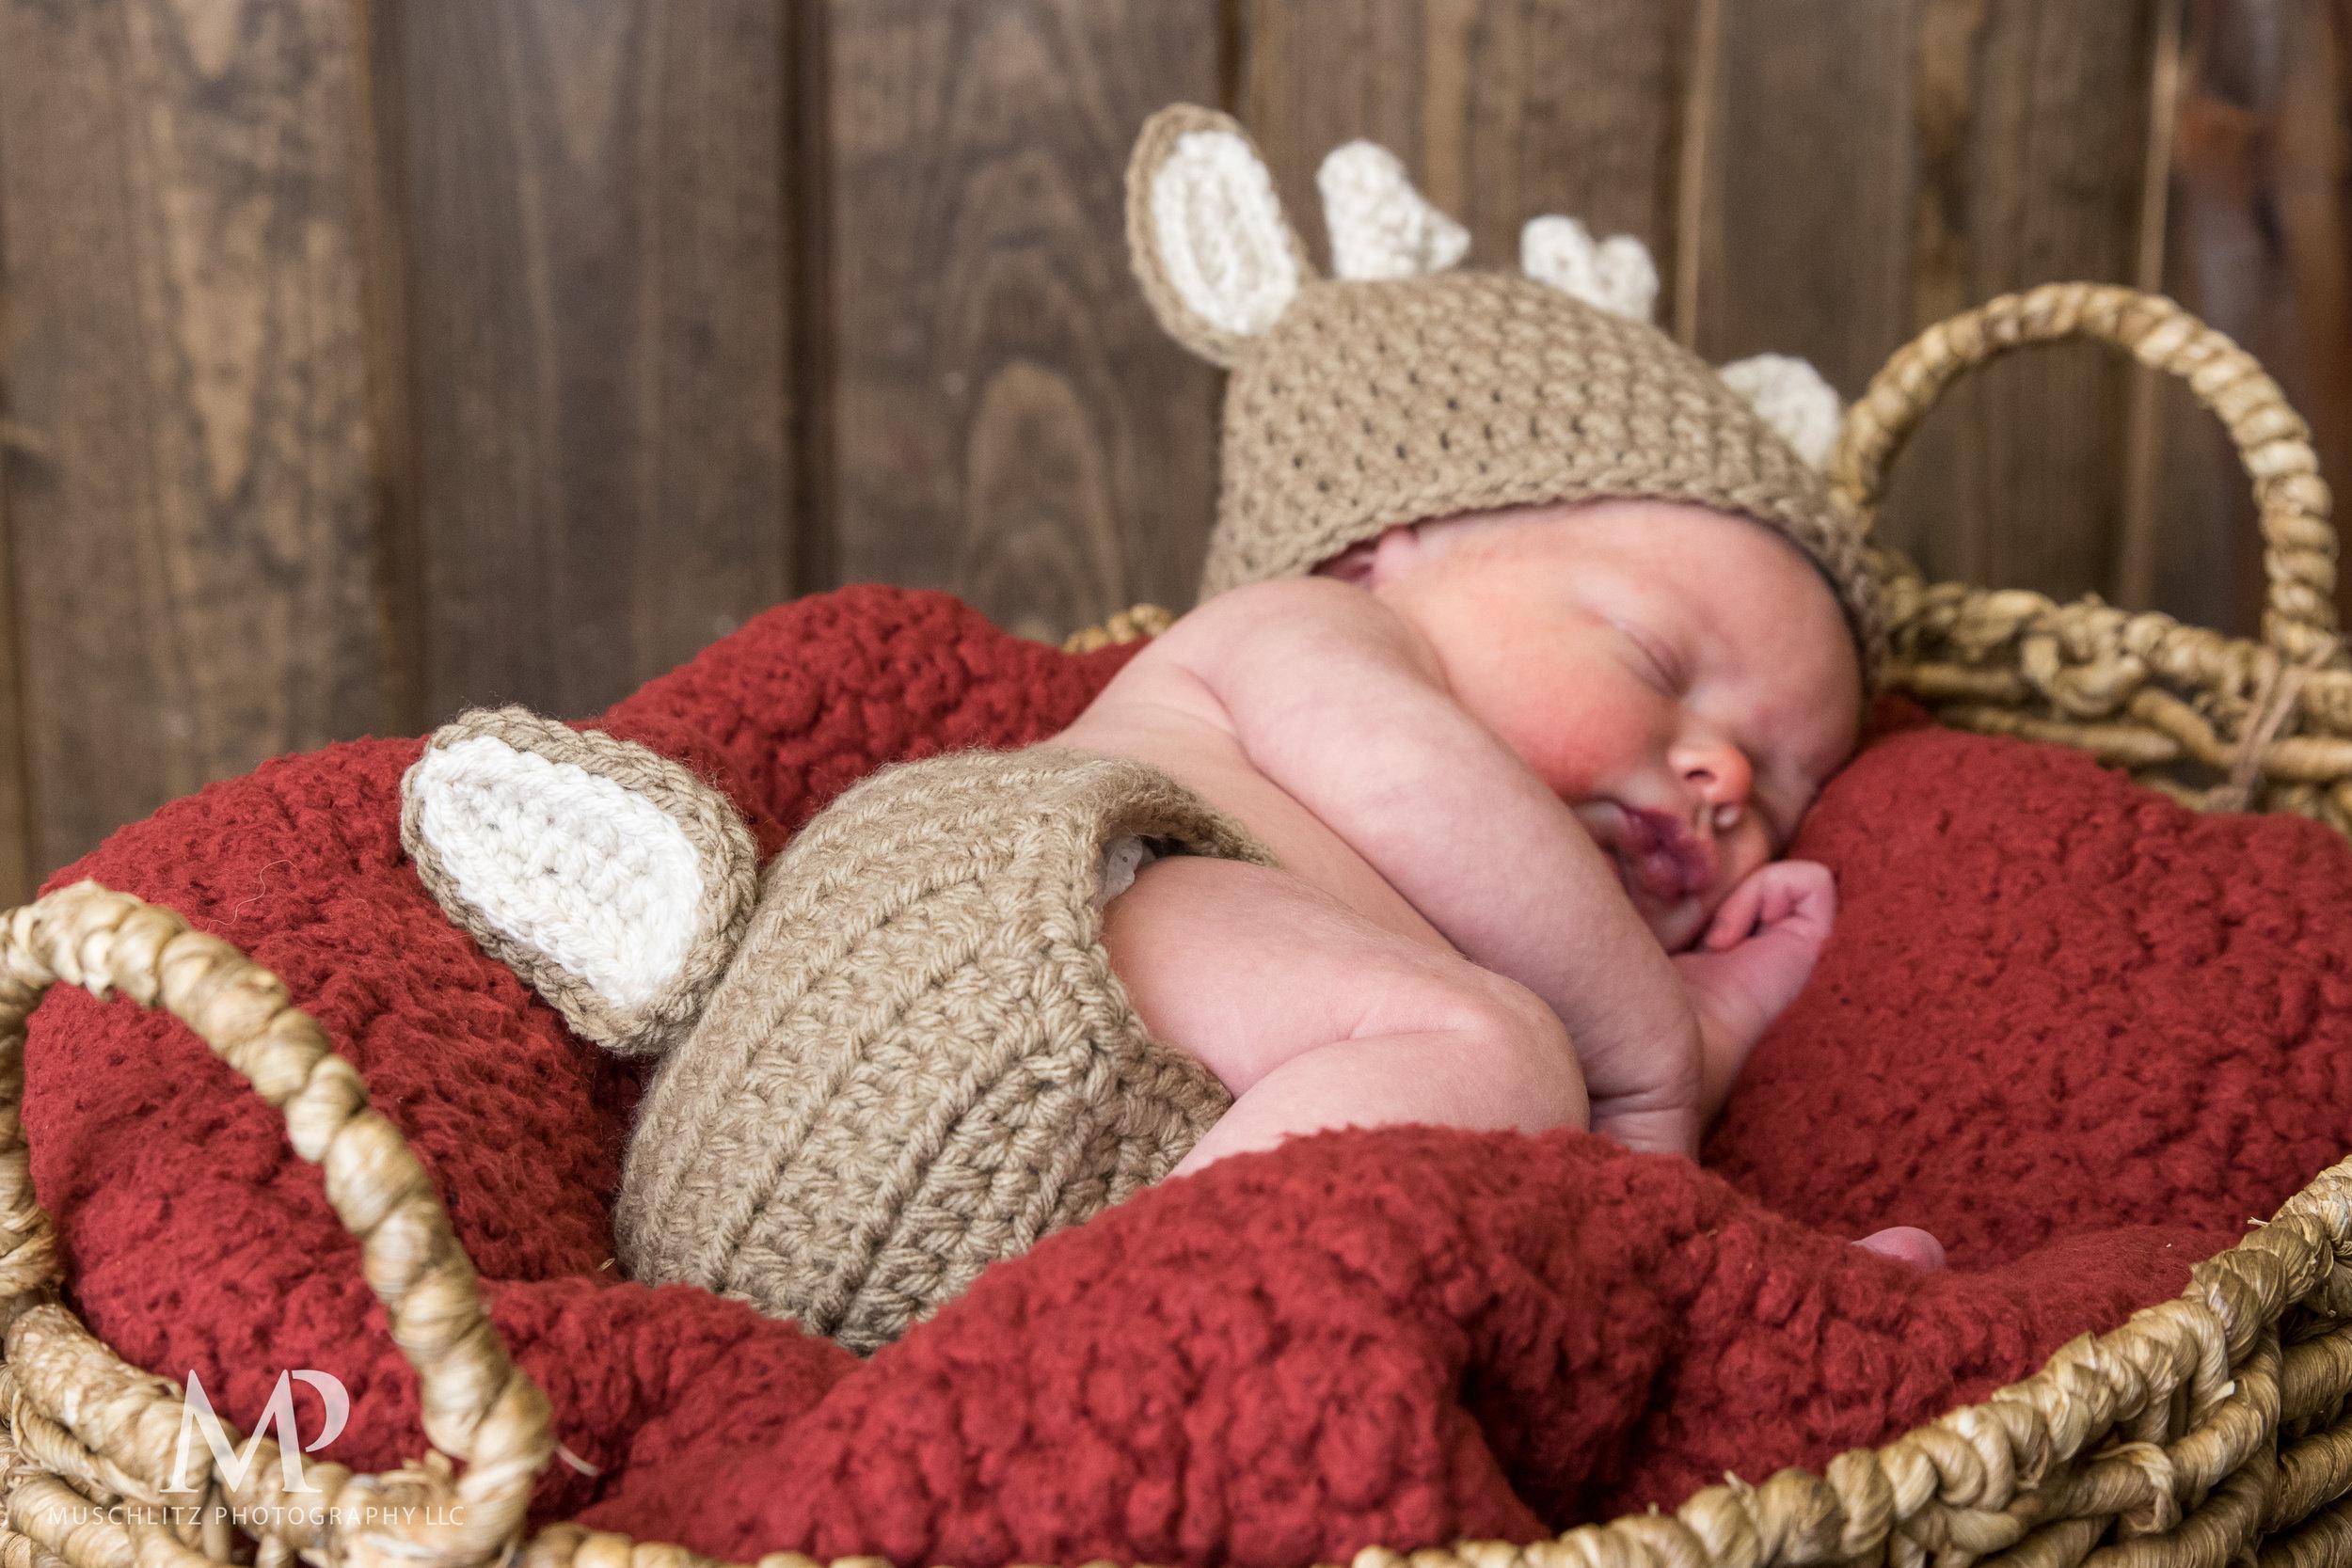 newborn-baby-portraits-photos-studio-holiday-columbus-gahanna-ohio-muschlitz-photography-002.JPG